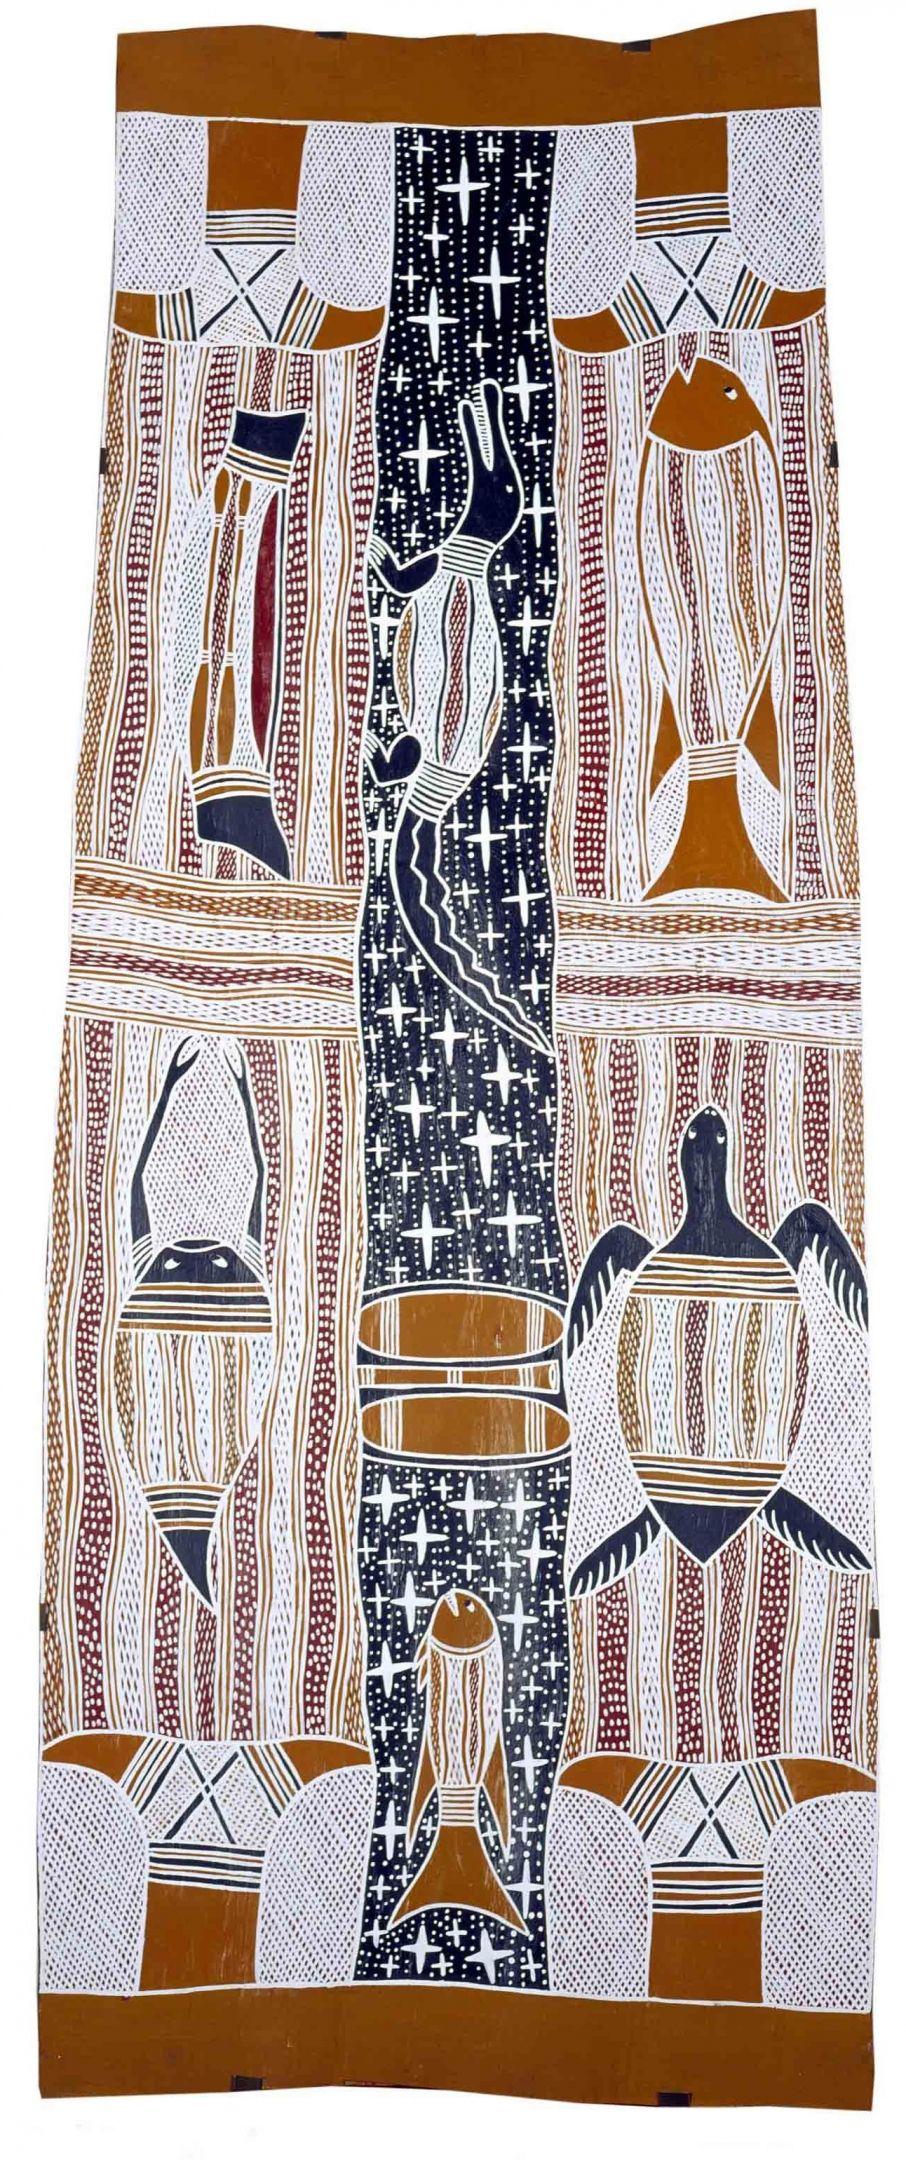 Pin by Ben DiAnna on Munky River Aboriginal art